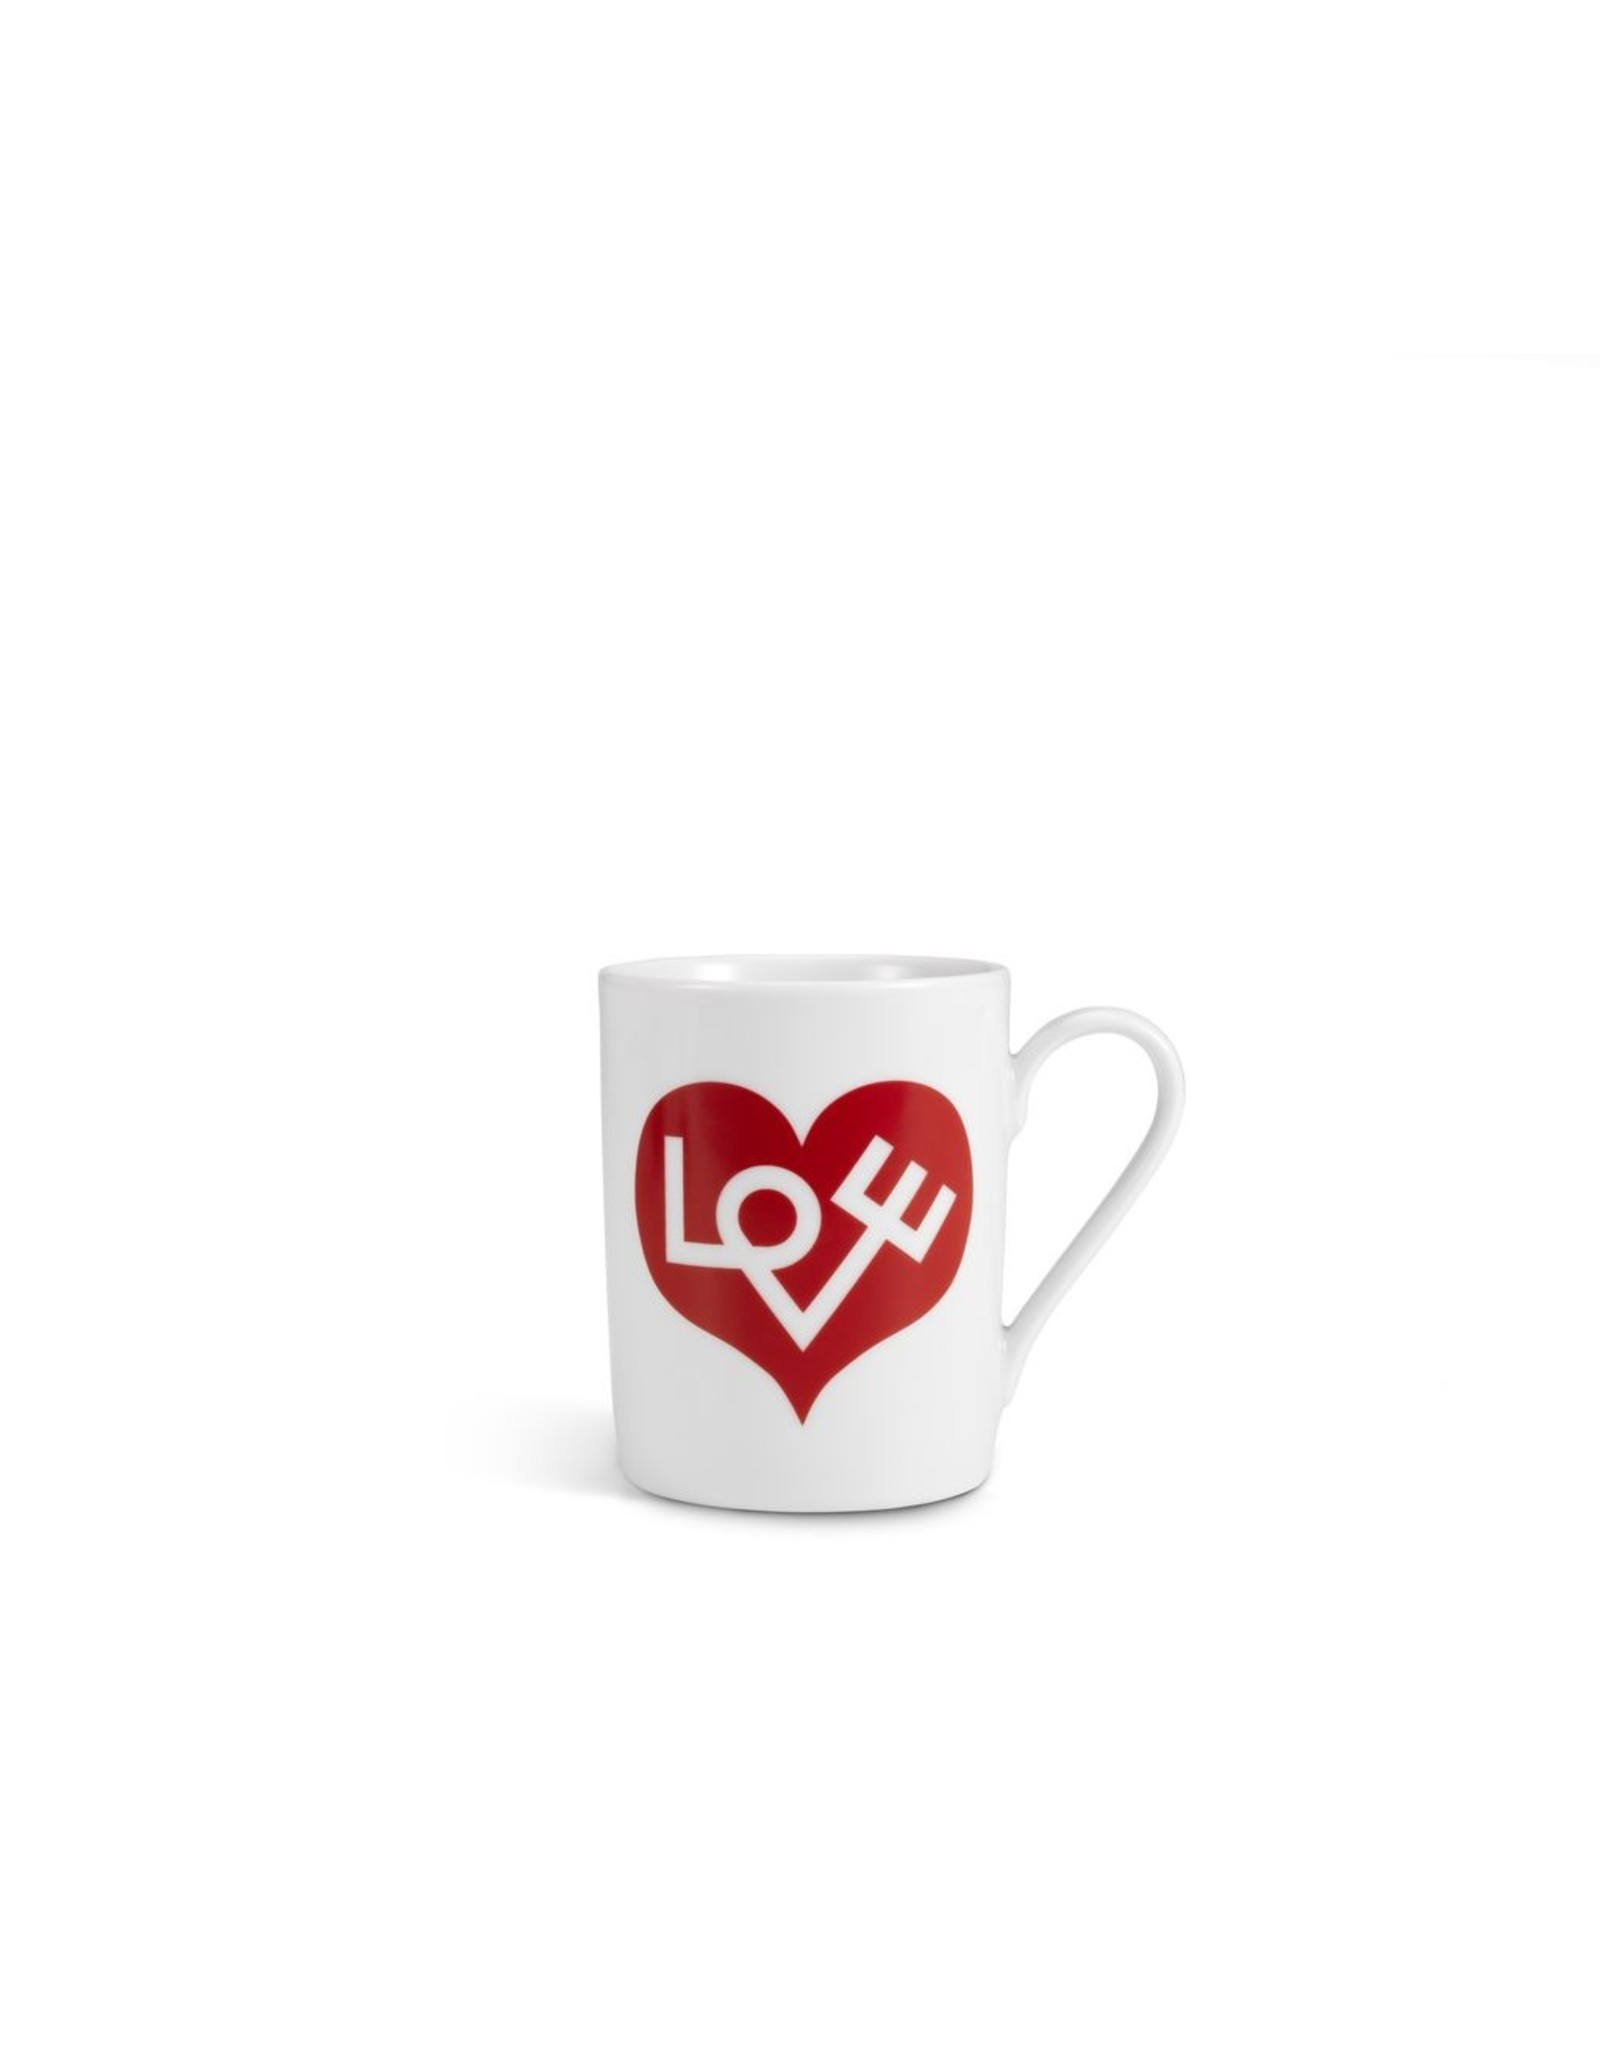 VITRA COFFEE MUG LOVE HEART RED